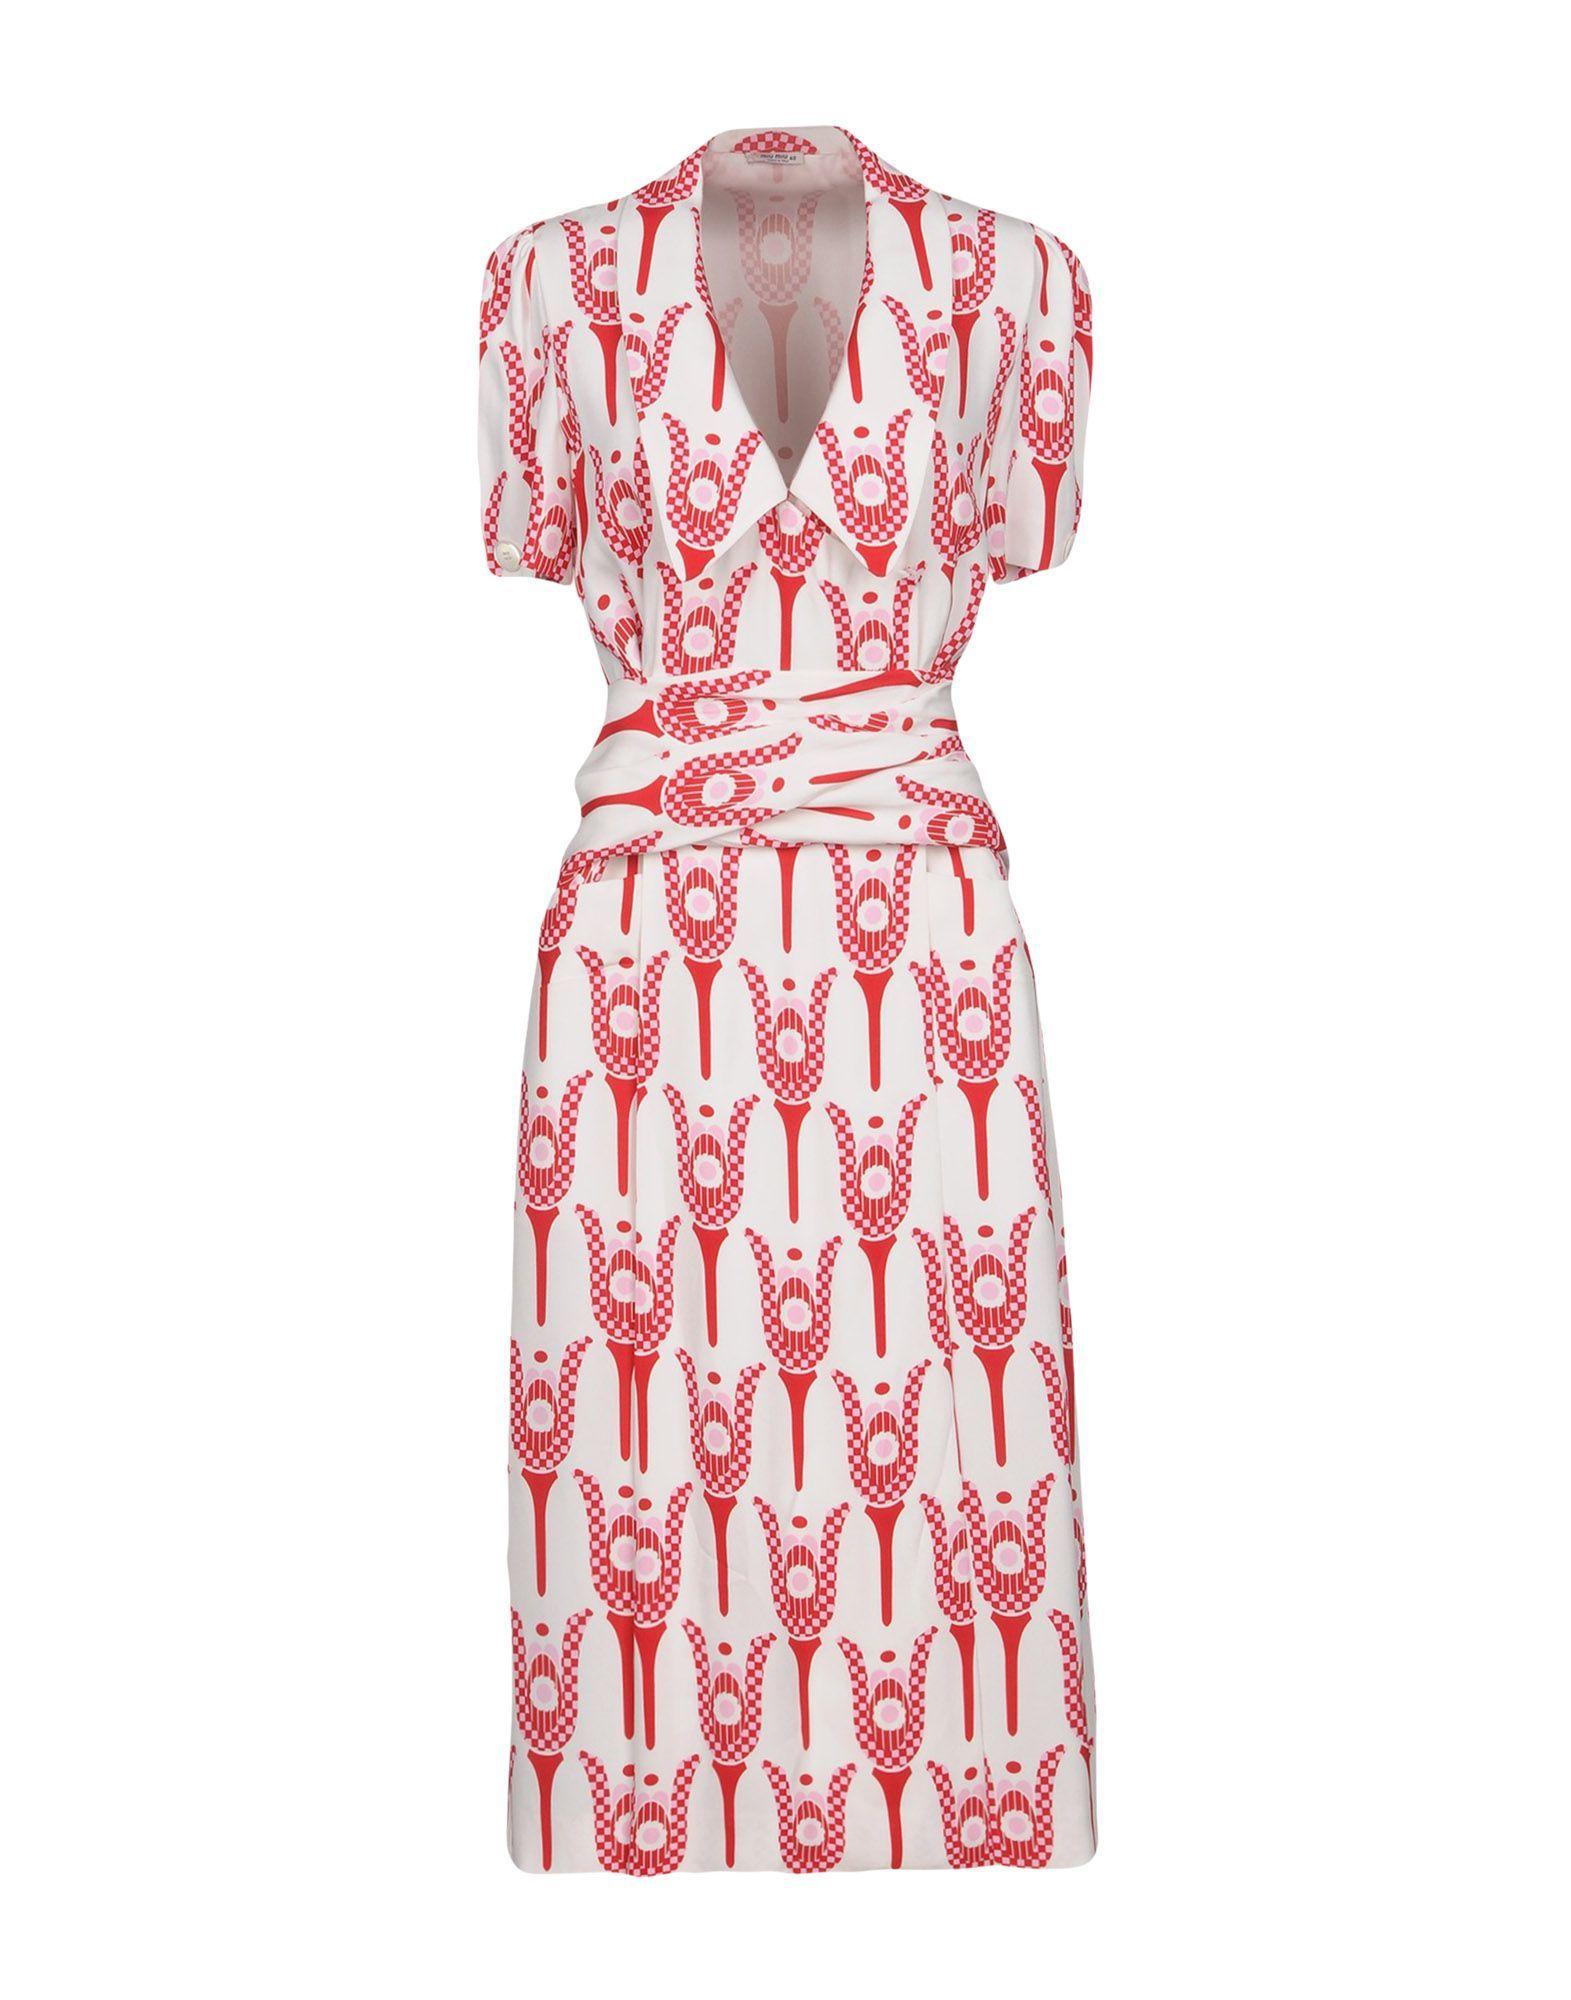 DRESSES - 3/4 length dresses Miu Miu Sale Sast uPipaKN